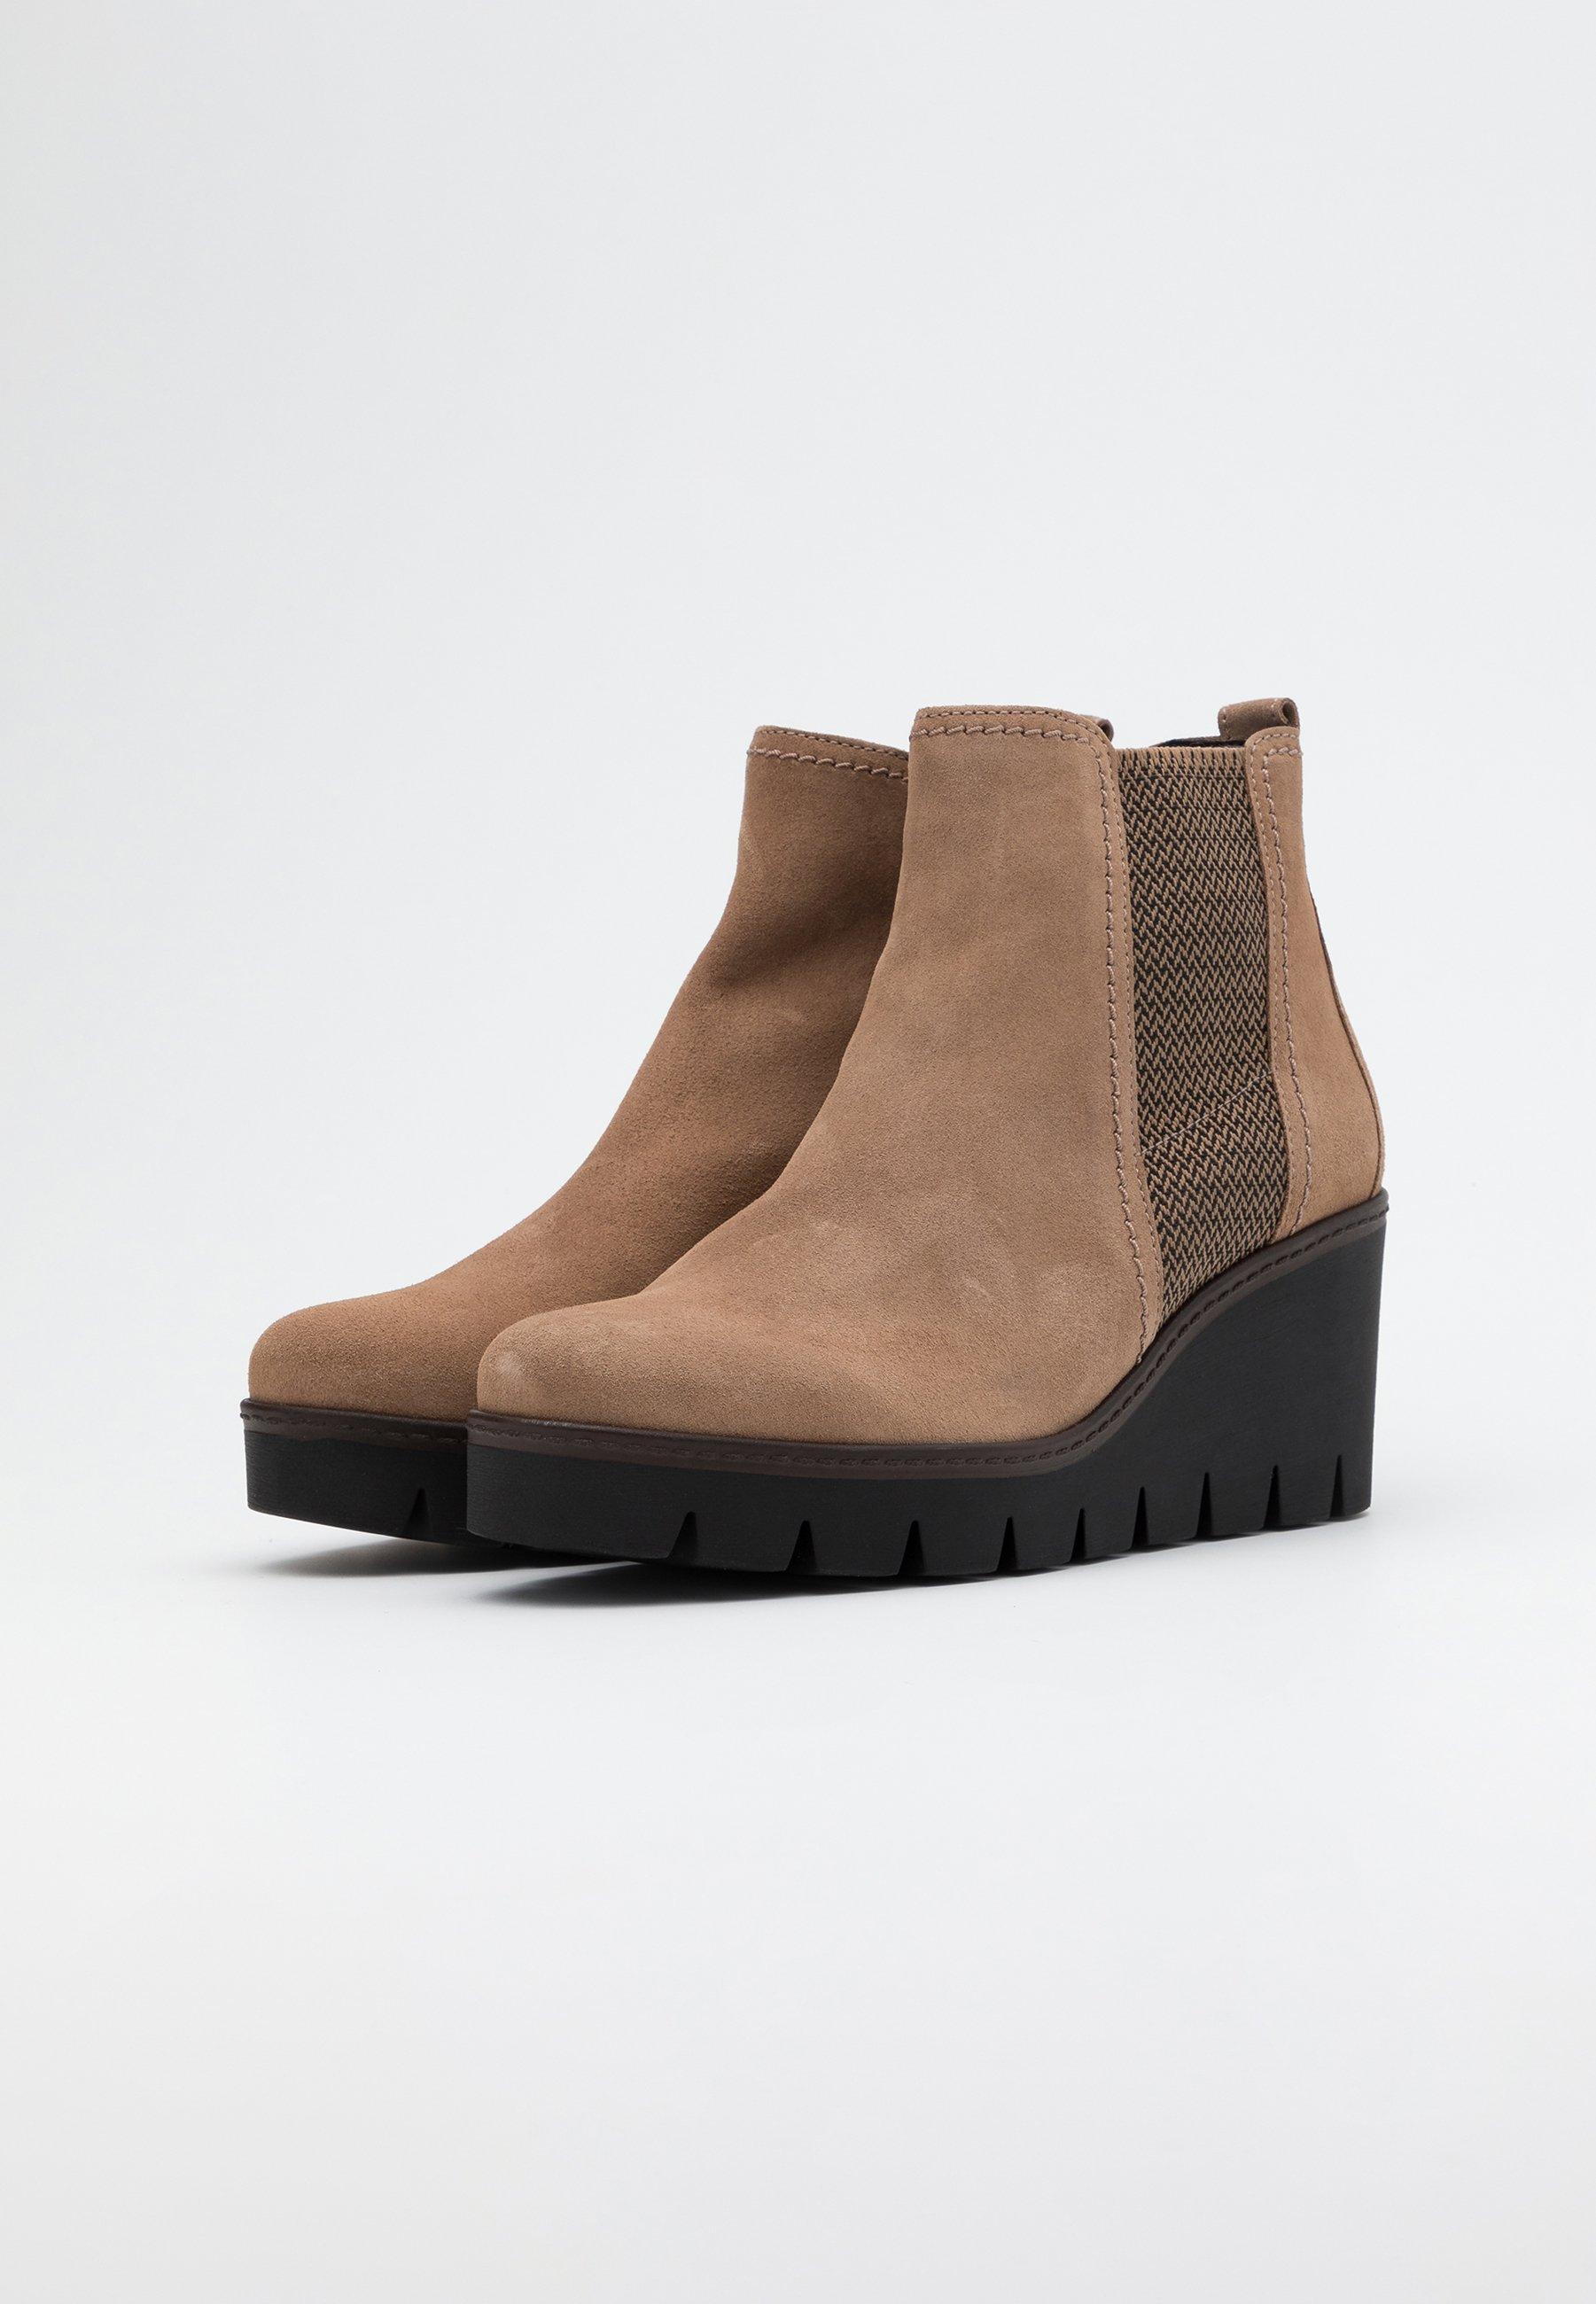 Gabor Ankle Boot desert cognac/beige